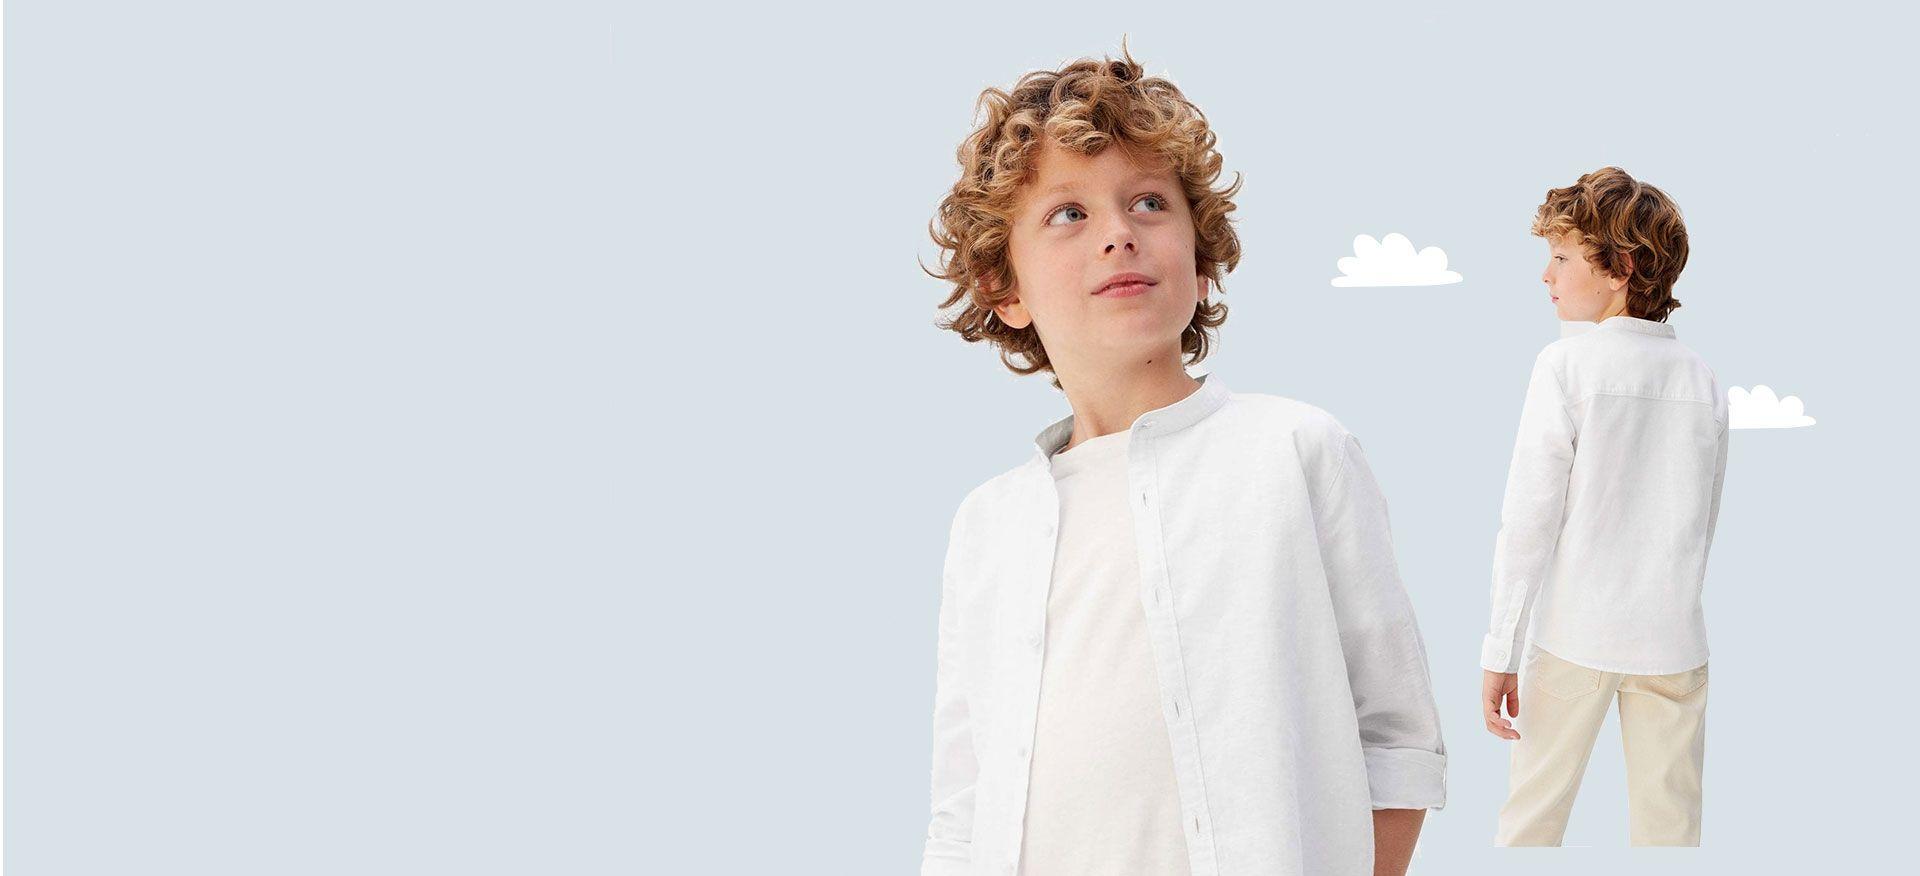 Armania_Kids-3